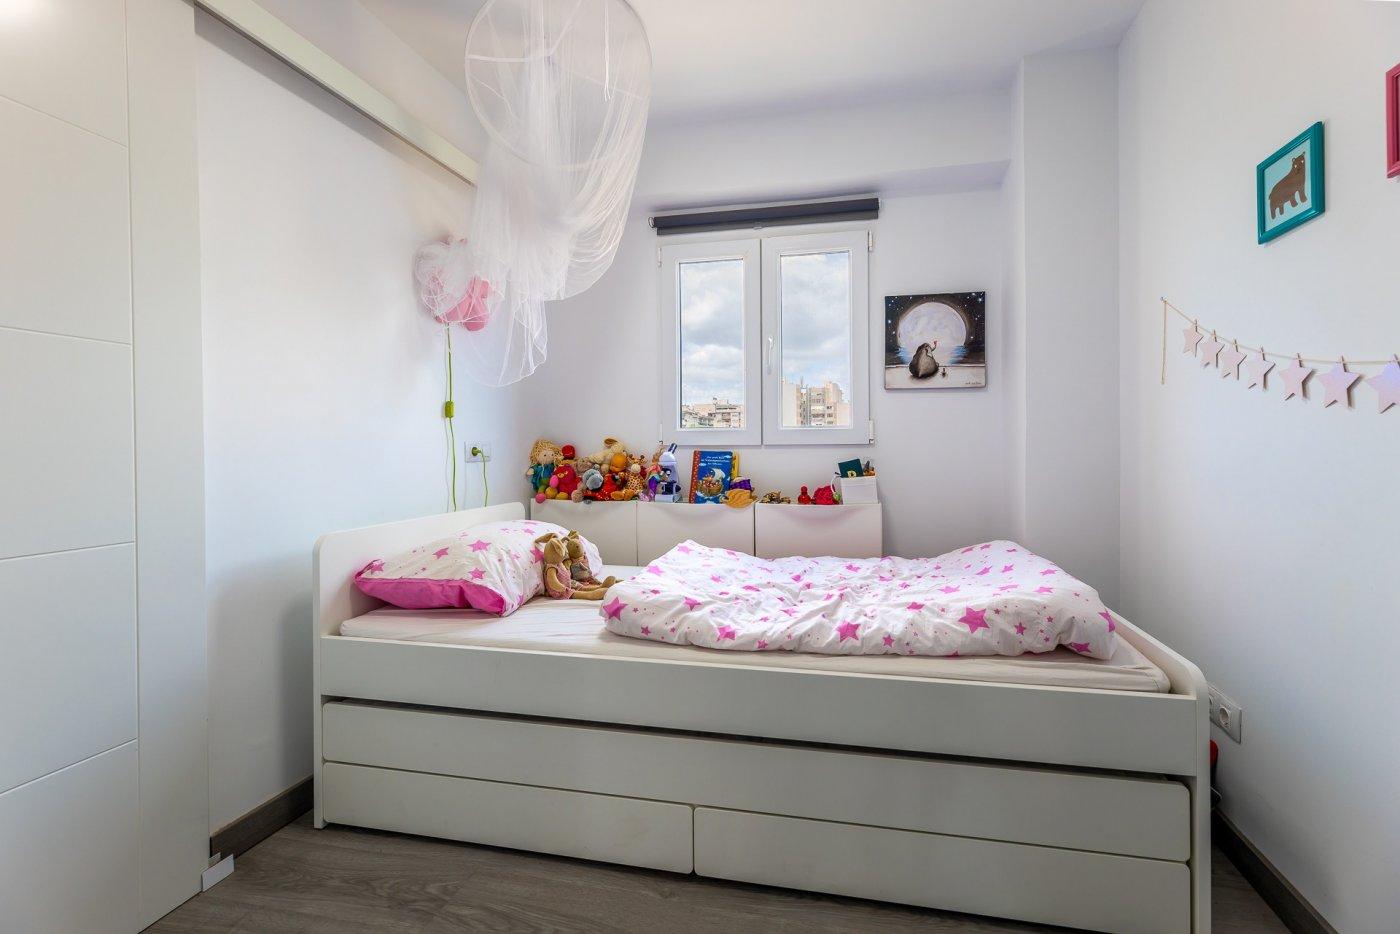 Acogedor piso en zona foners, palma - imagenInmueble14